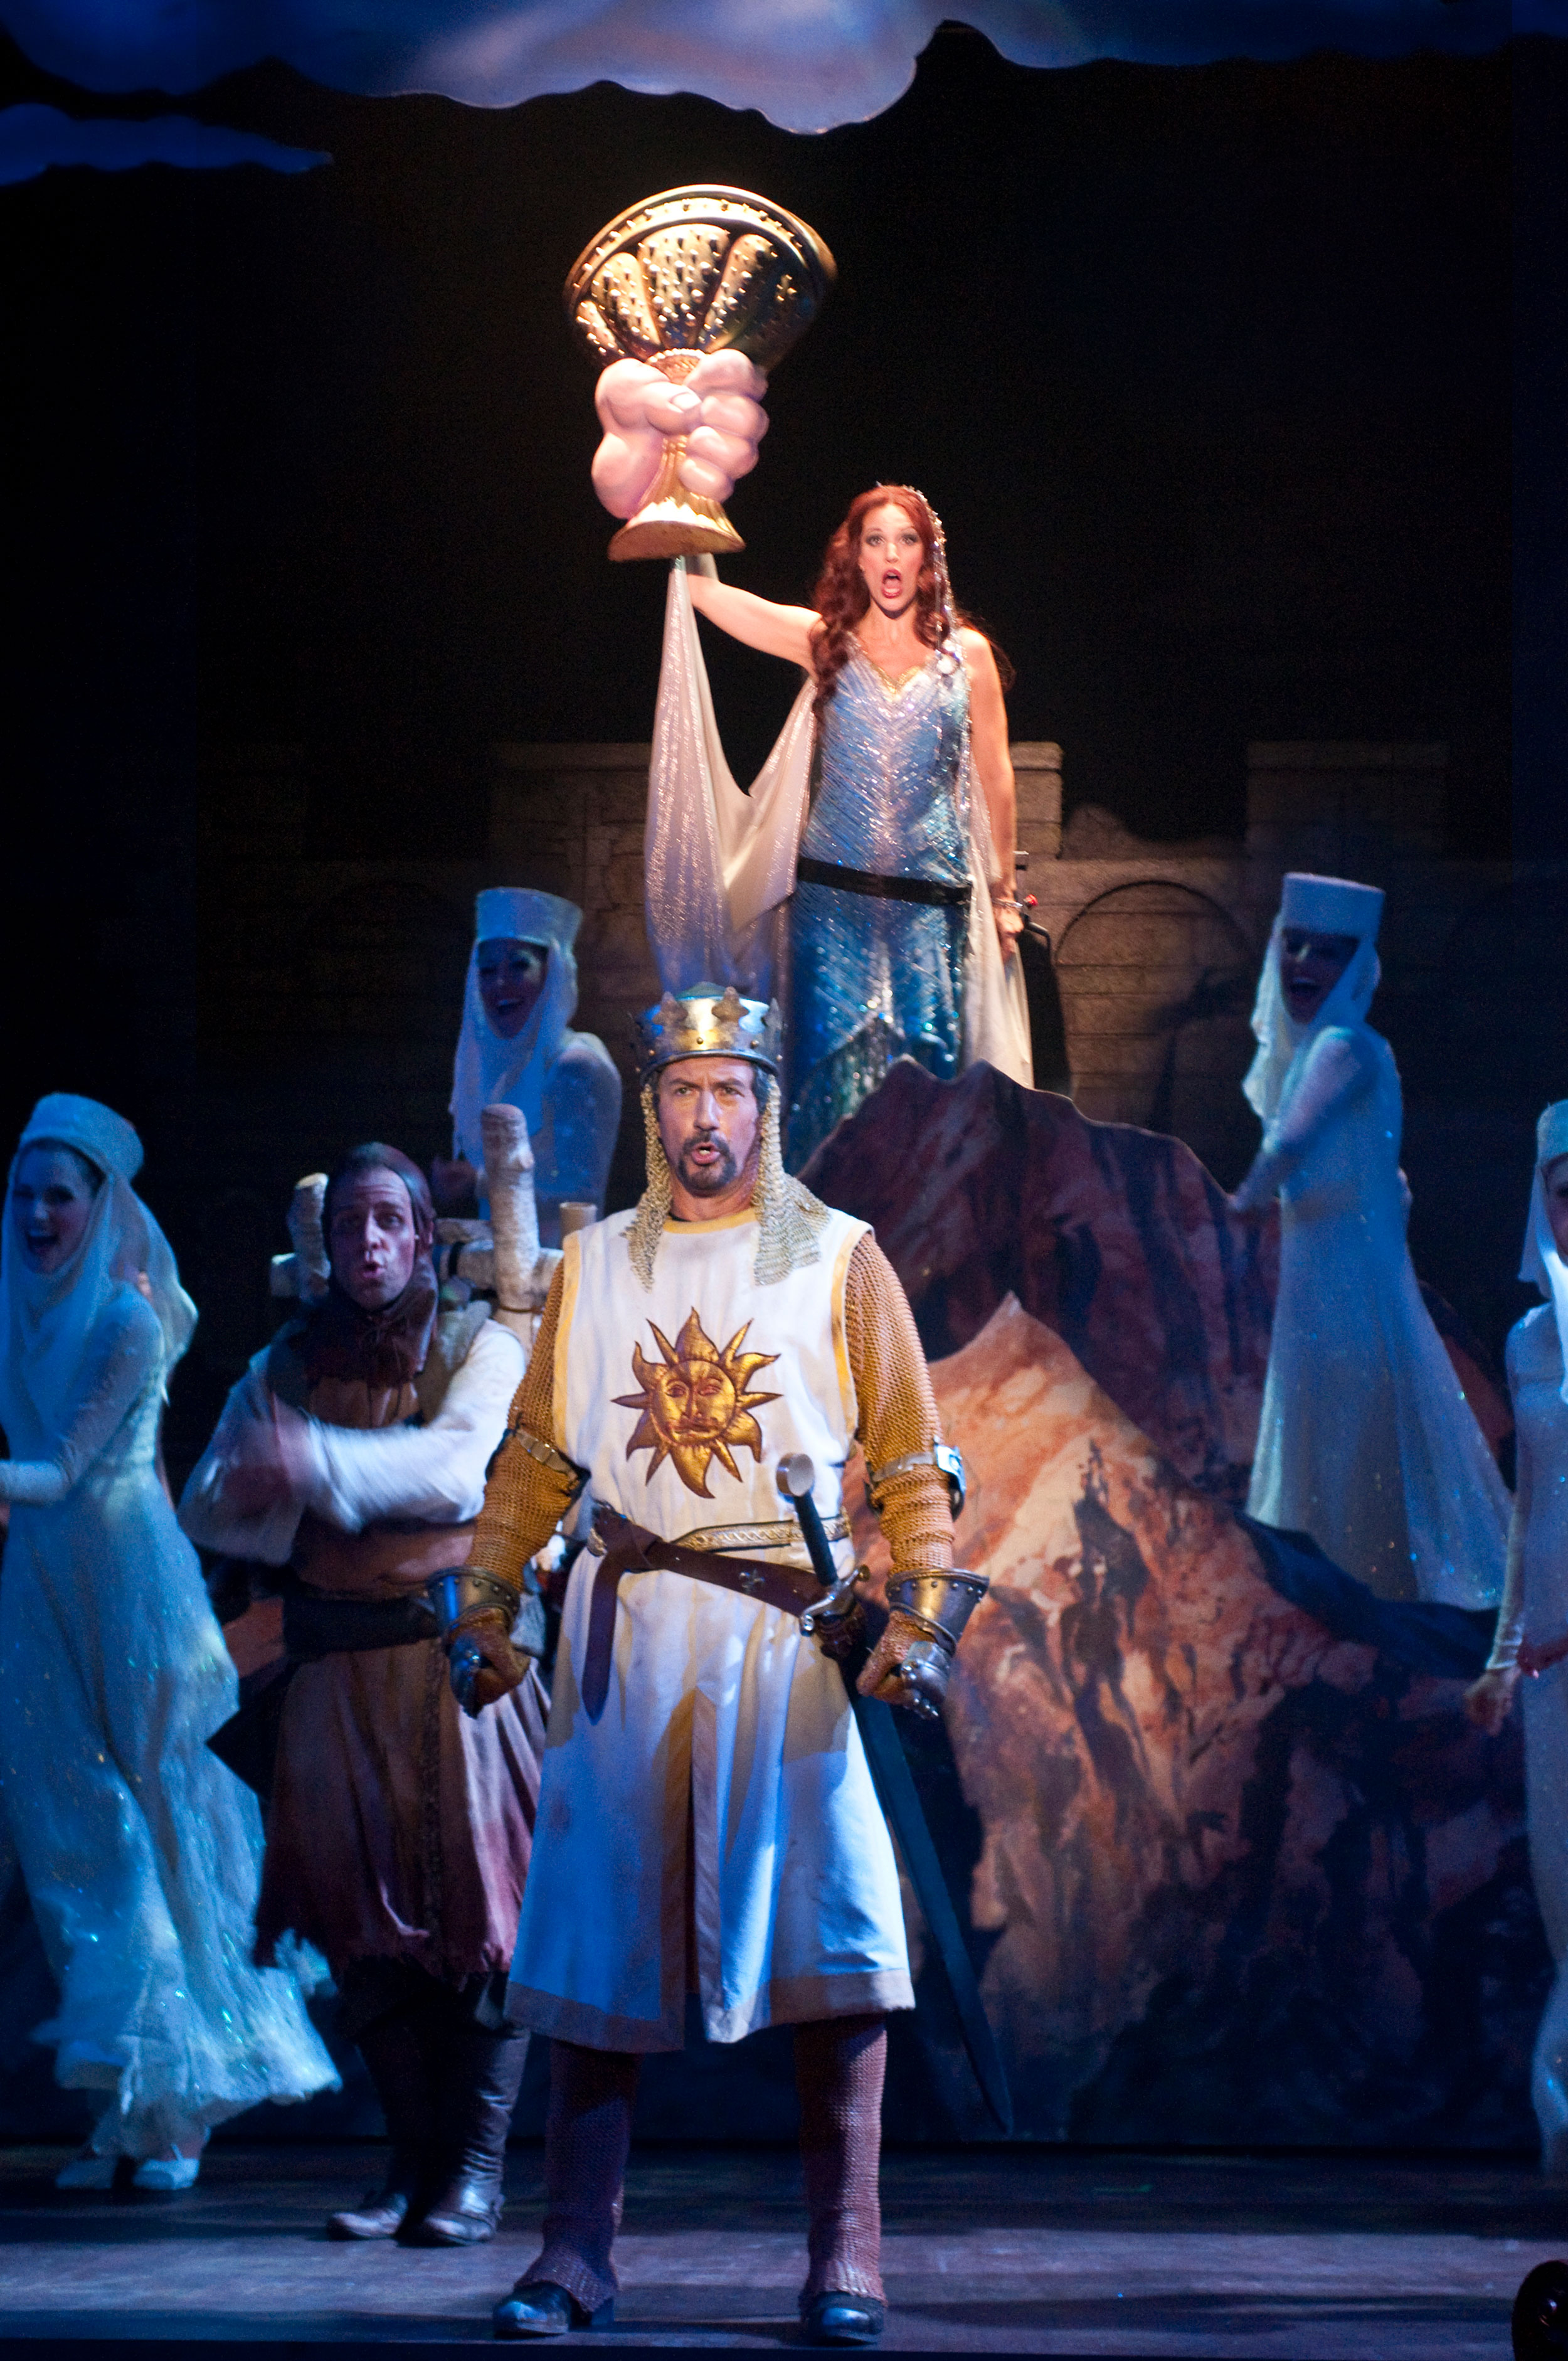 2010_OP_Monty-Python's-Spamalot_Charles-Shaughnessy_as_King-Arthur_Rachel-York_as_Lady-of-the-Lake_RGB.jpg